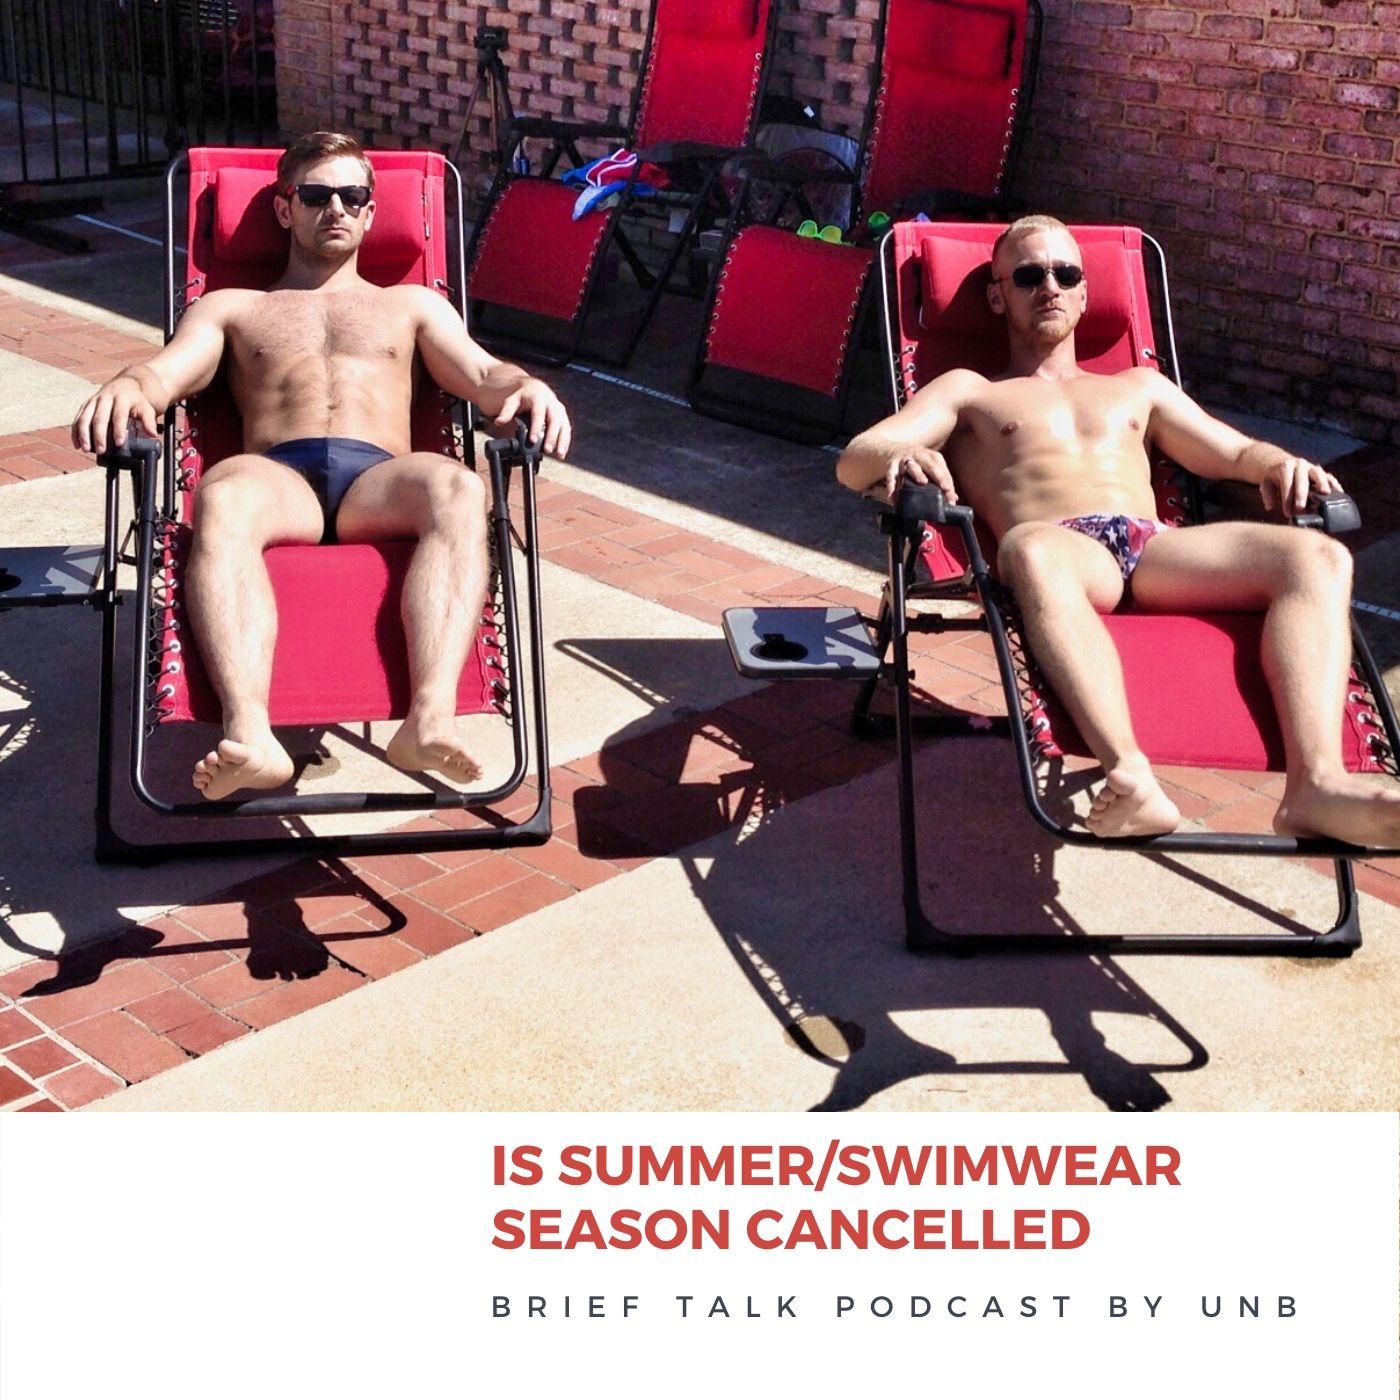 UNB Brief Talk Podcast - Is Summer/Swimwear Season Closed?